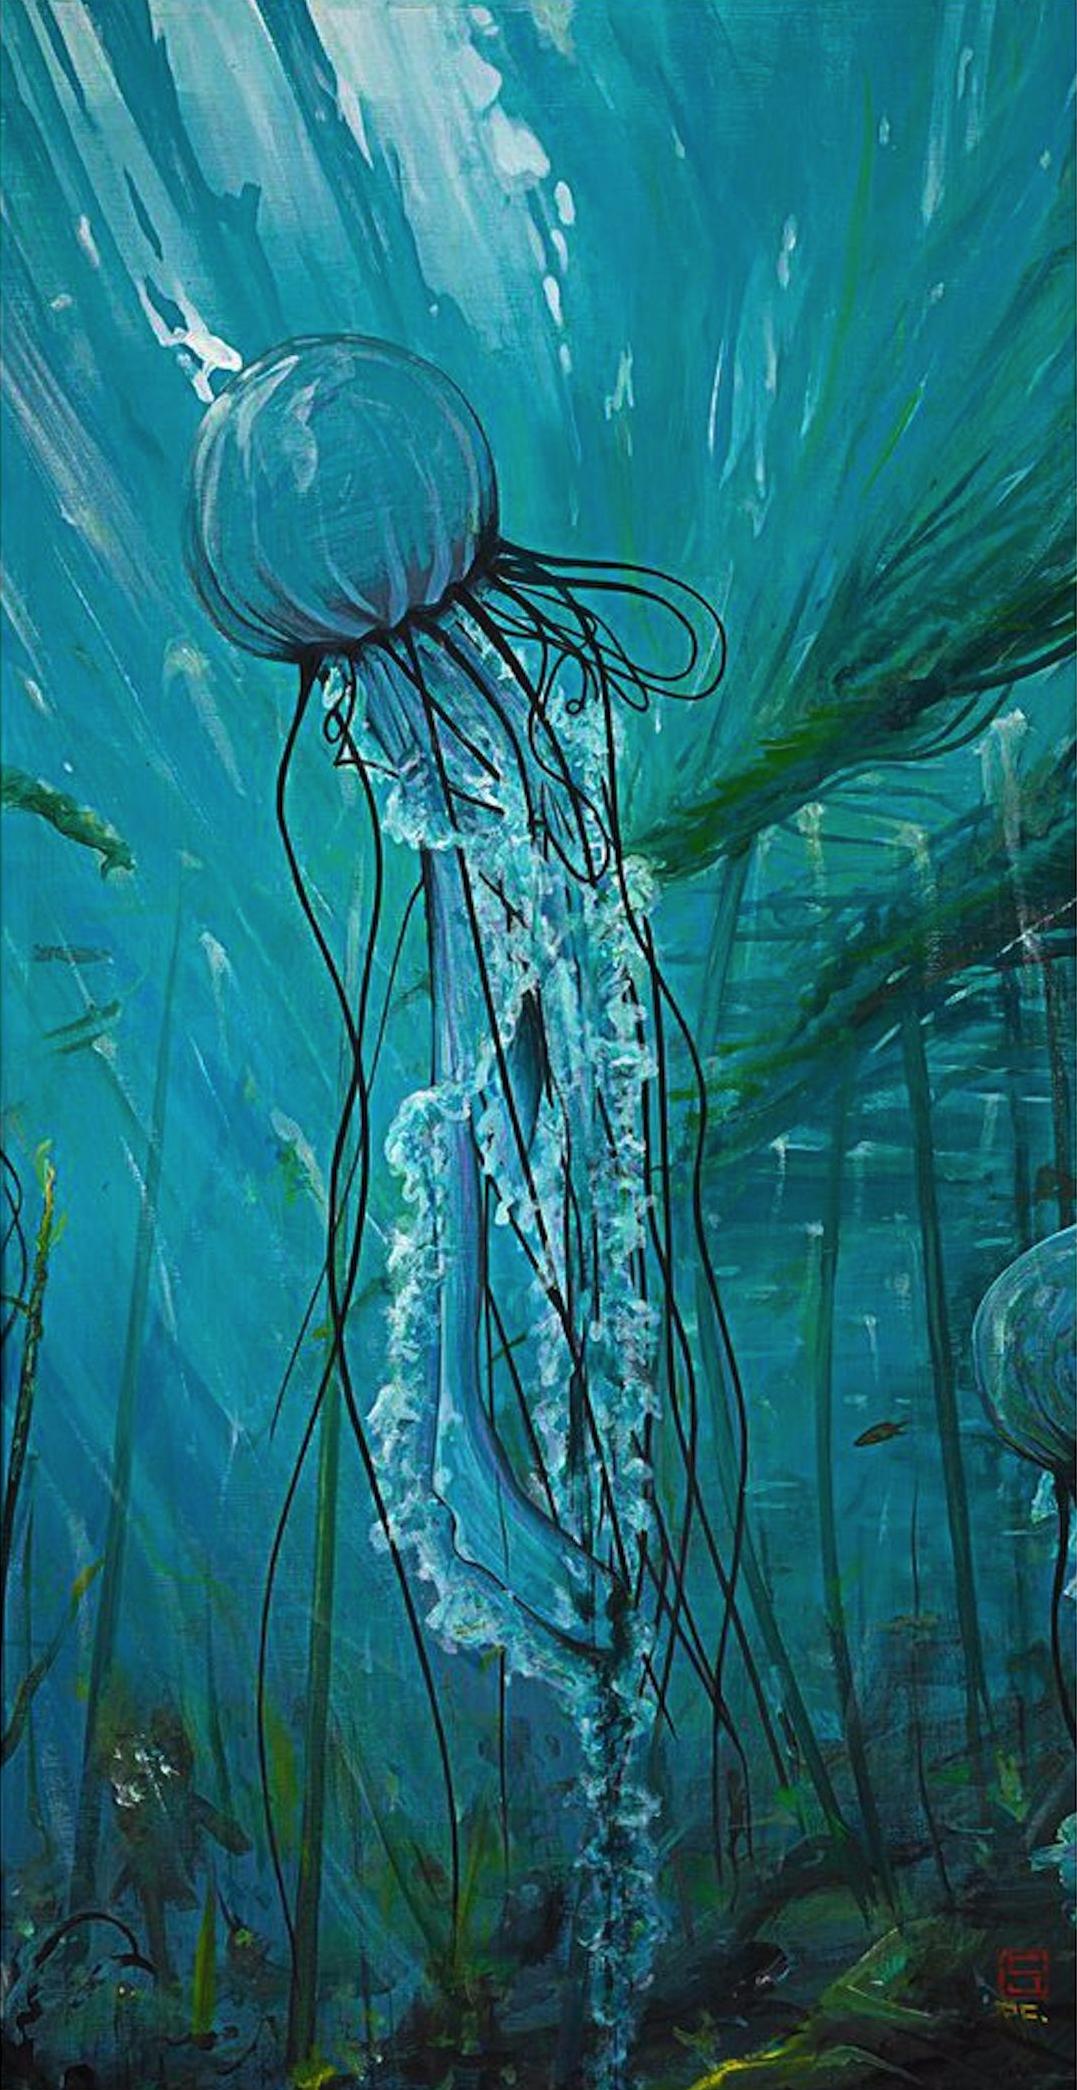 Interview with Painter, CJ Troxell on Jung Katz Art Blog